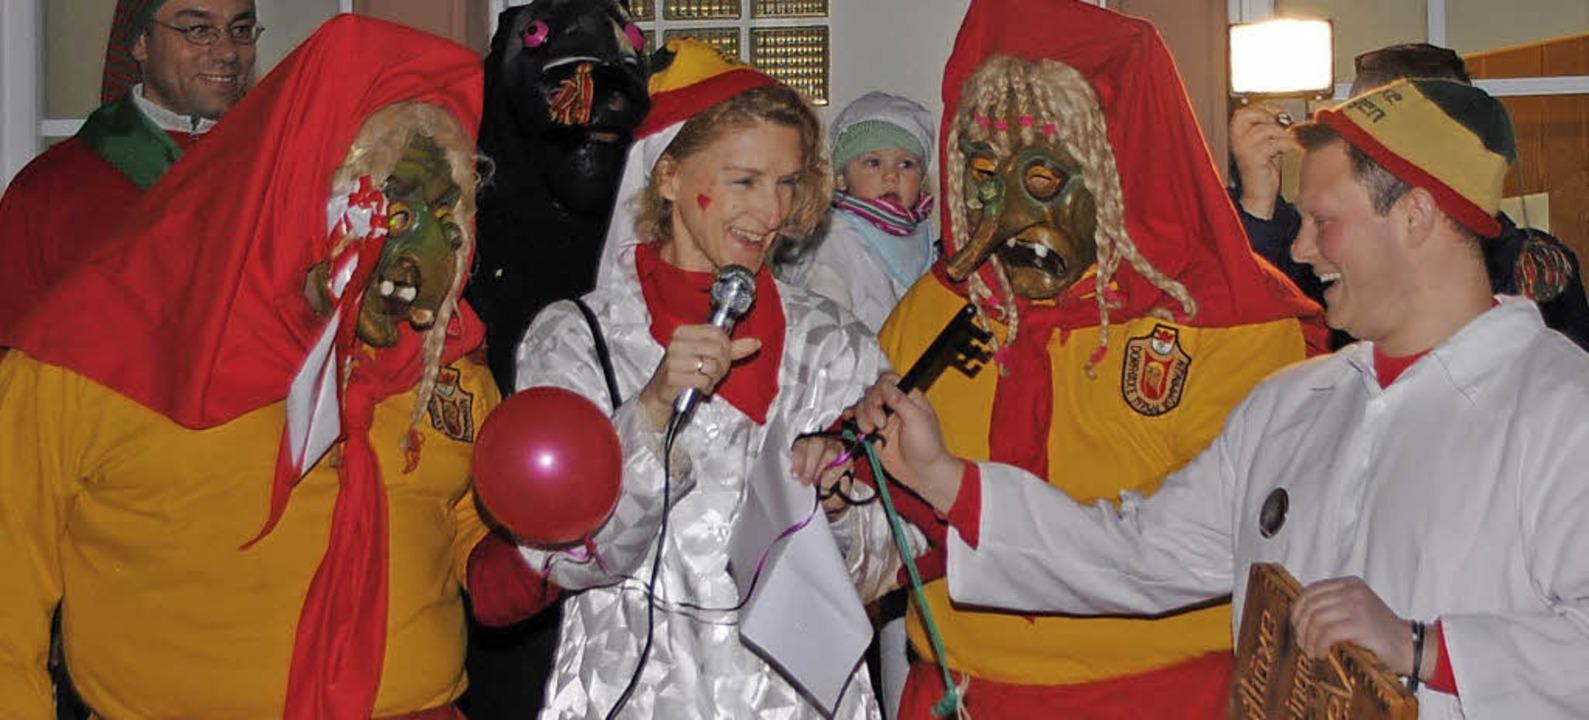 Rümmingens Bürgermeisterin  Meier beugte sich den Narren.     Foto: Sedlak